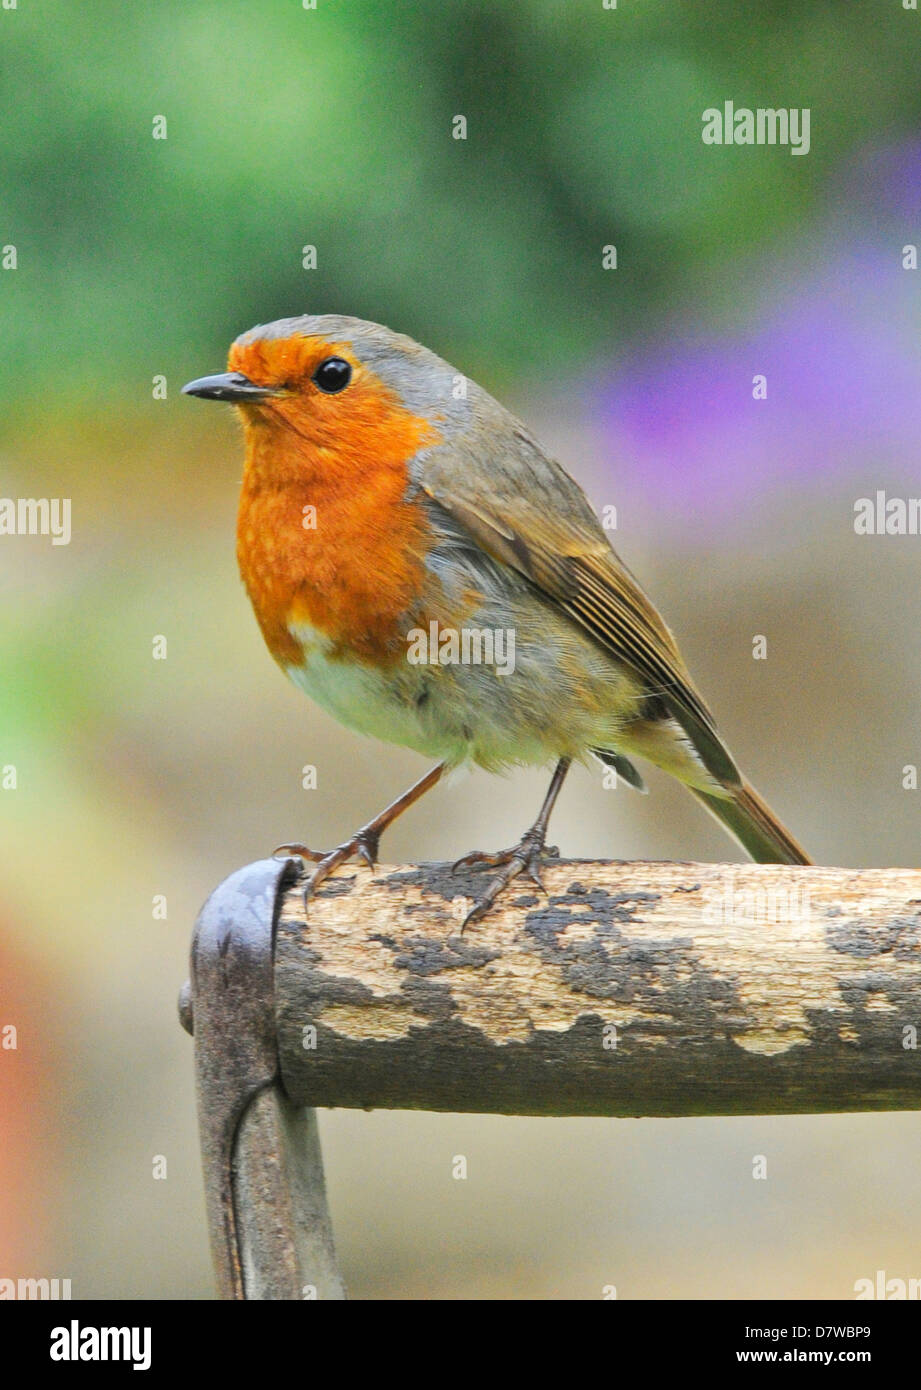 A classic view of a Robin European Robin (Erithacus rubecula) - Stock Image